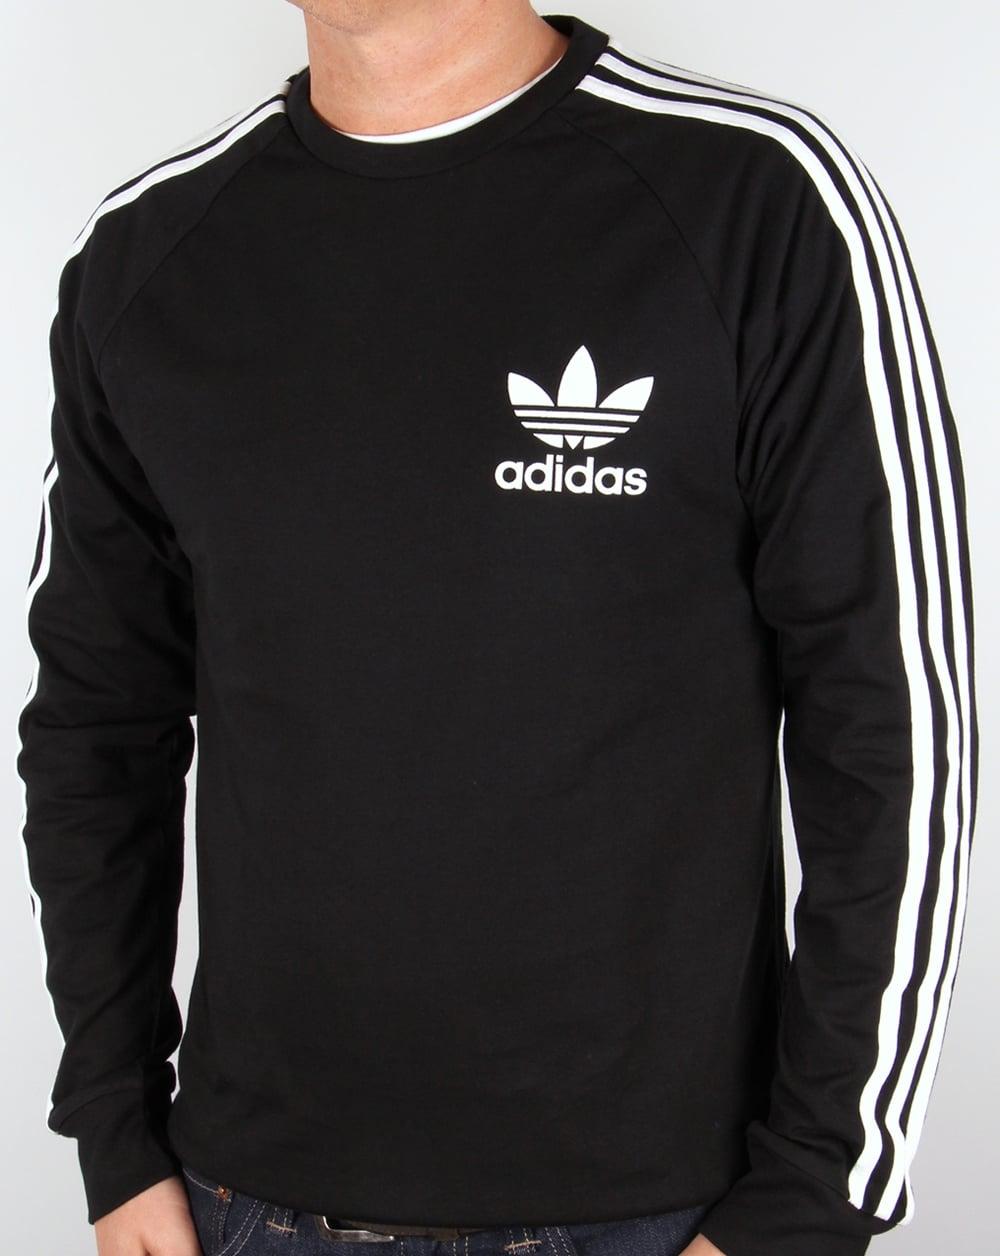 f98aaba1 Adidas Originals CLFN Long Sleeve T Shirt Black,trefoil,tee,mens